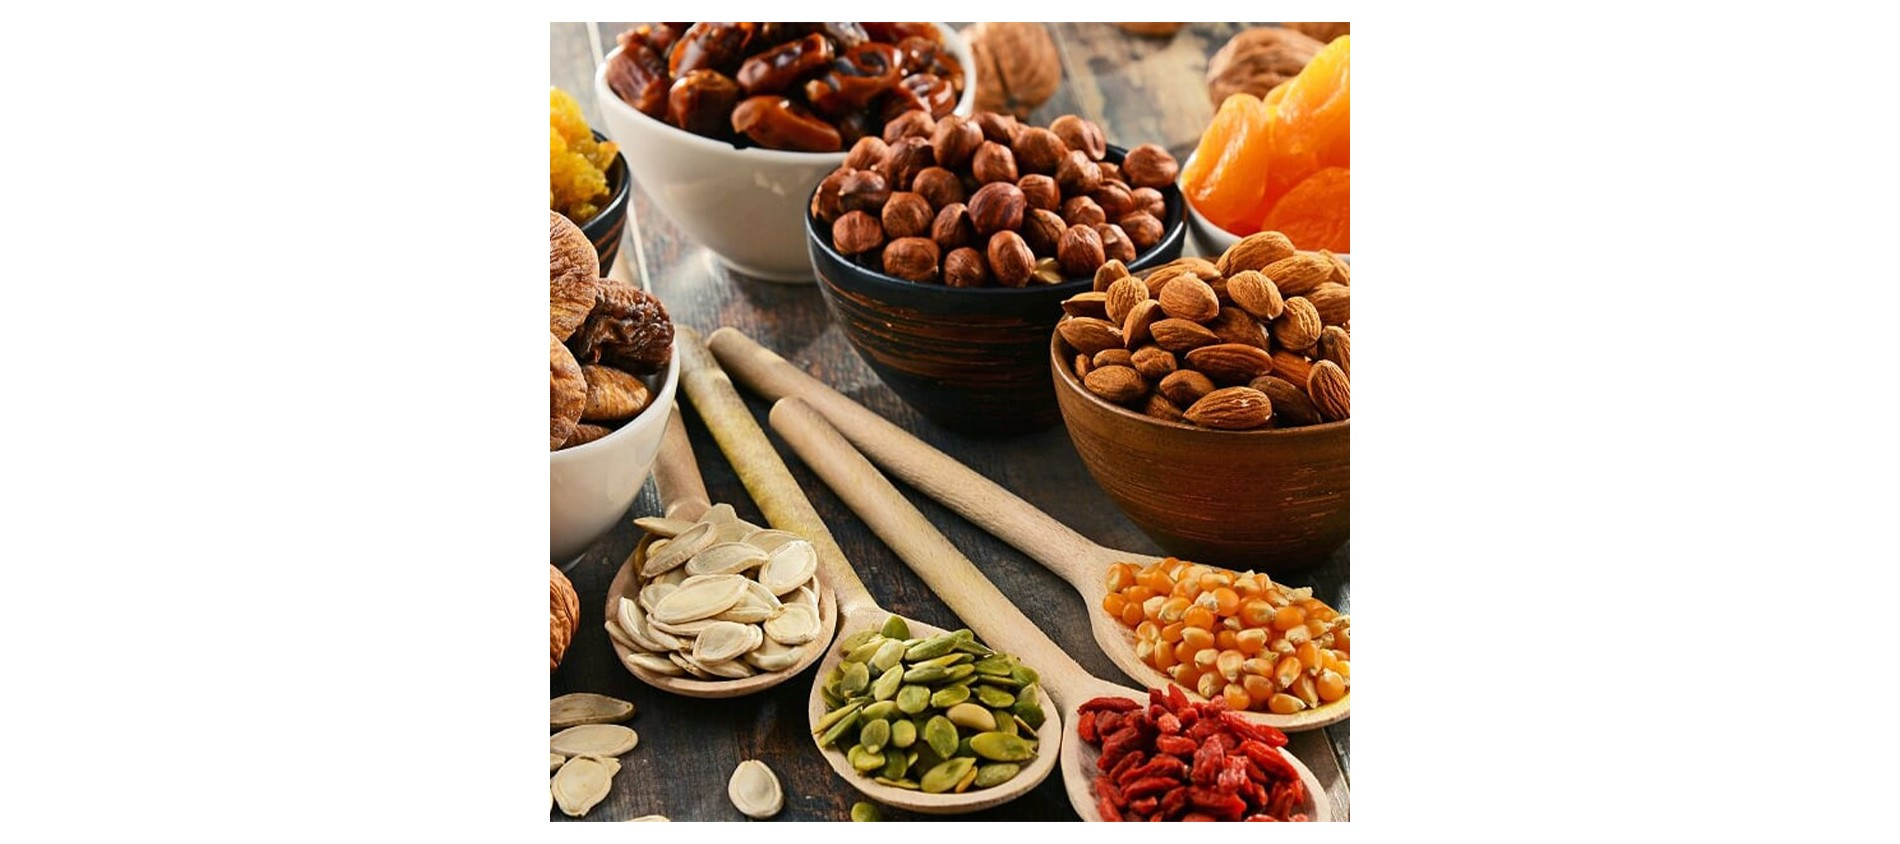 Fruits secs, à coques et graines